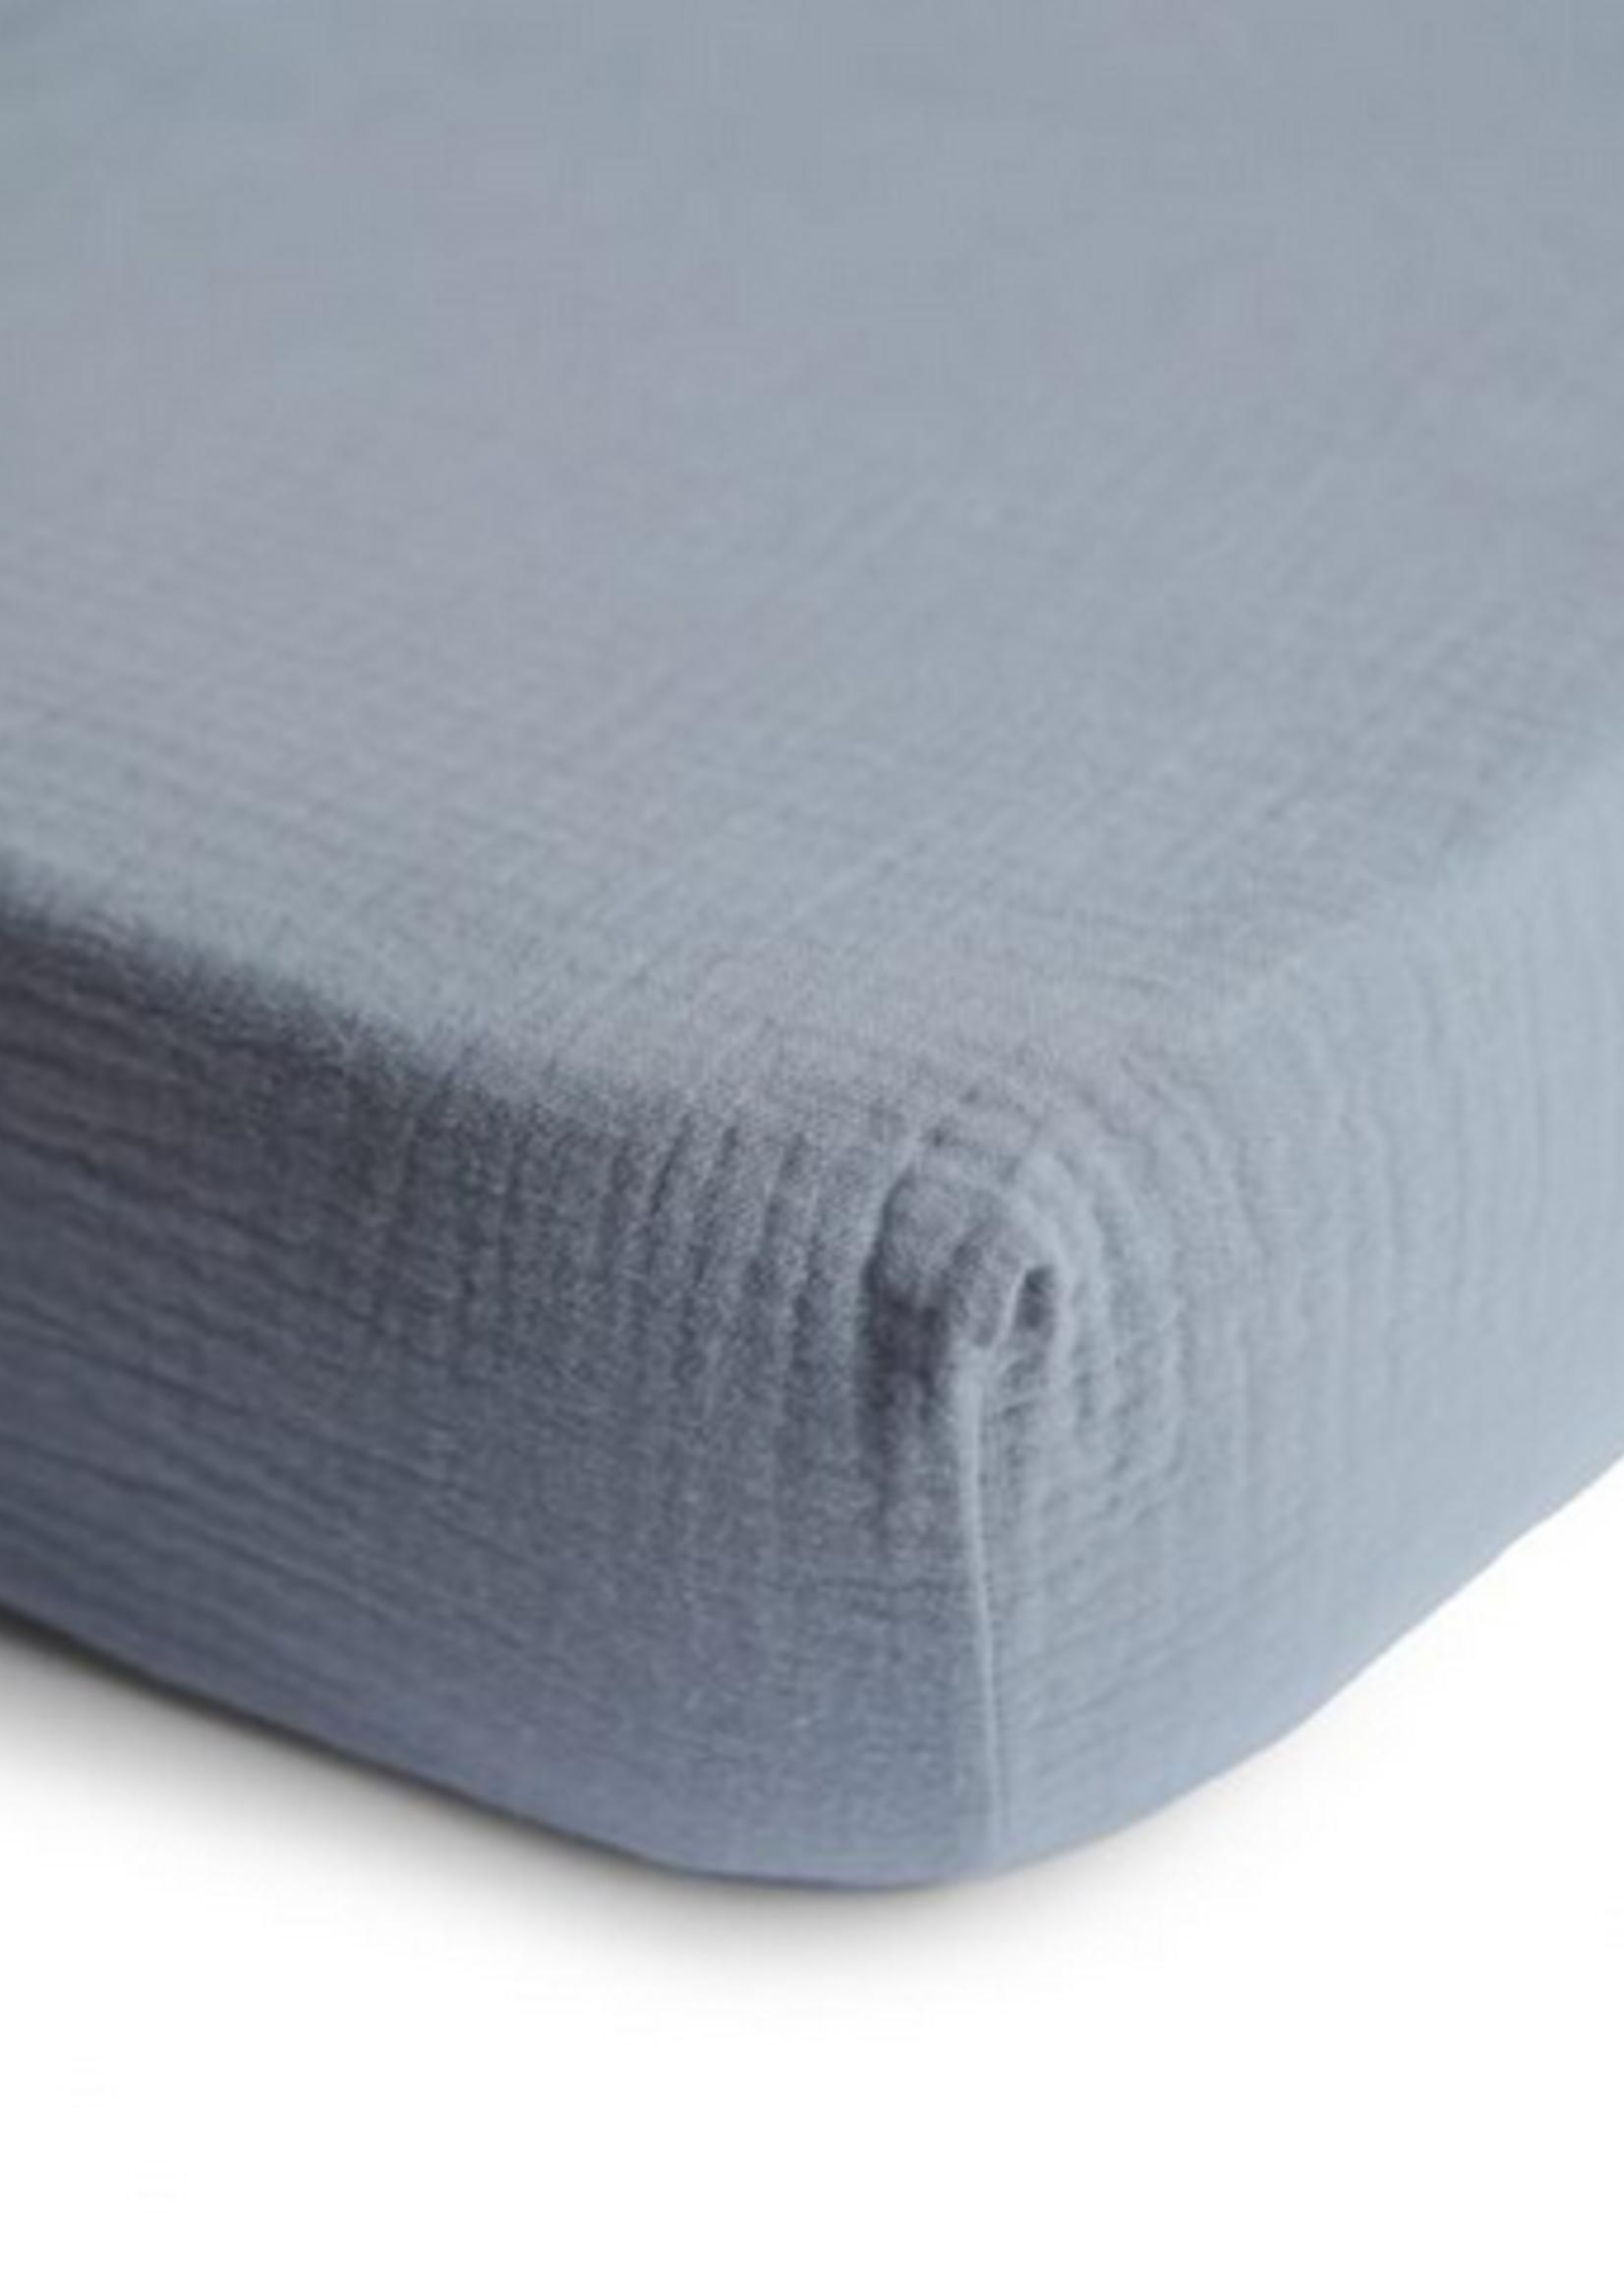 Elitaire Petite Extra Soft Muslin Crib Sheet in Tradewinds